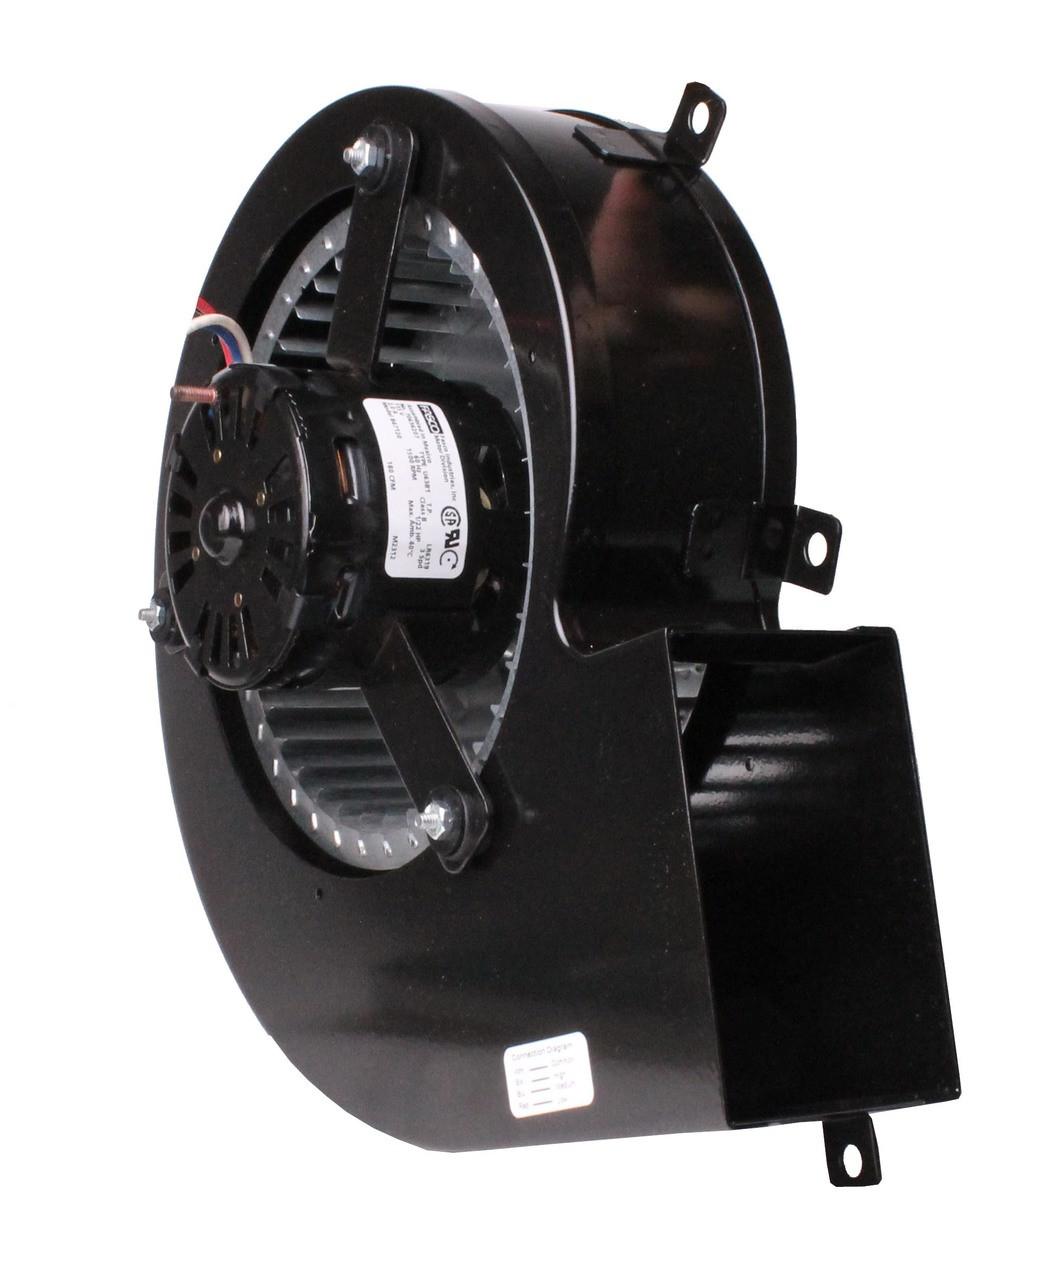 B47120__29669.1538147261?c=2&imbypass=on draft inducer blower 115 volts 3 speed fasco b47120 (dayton ref